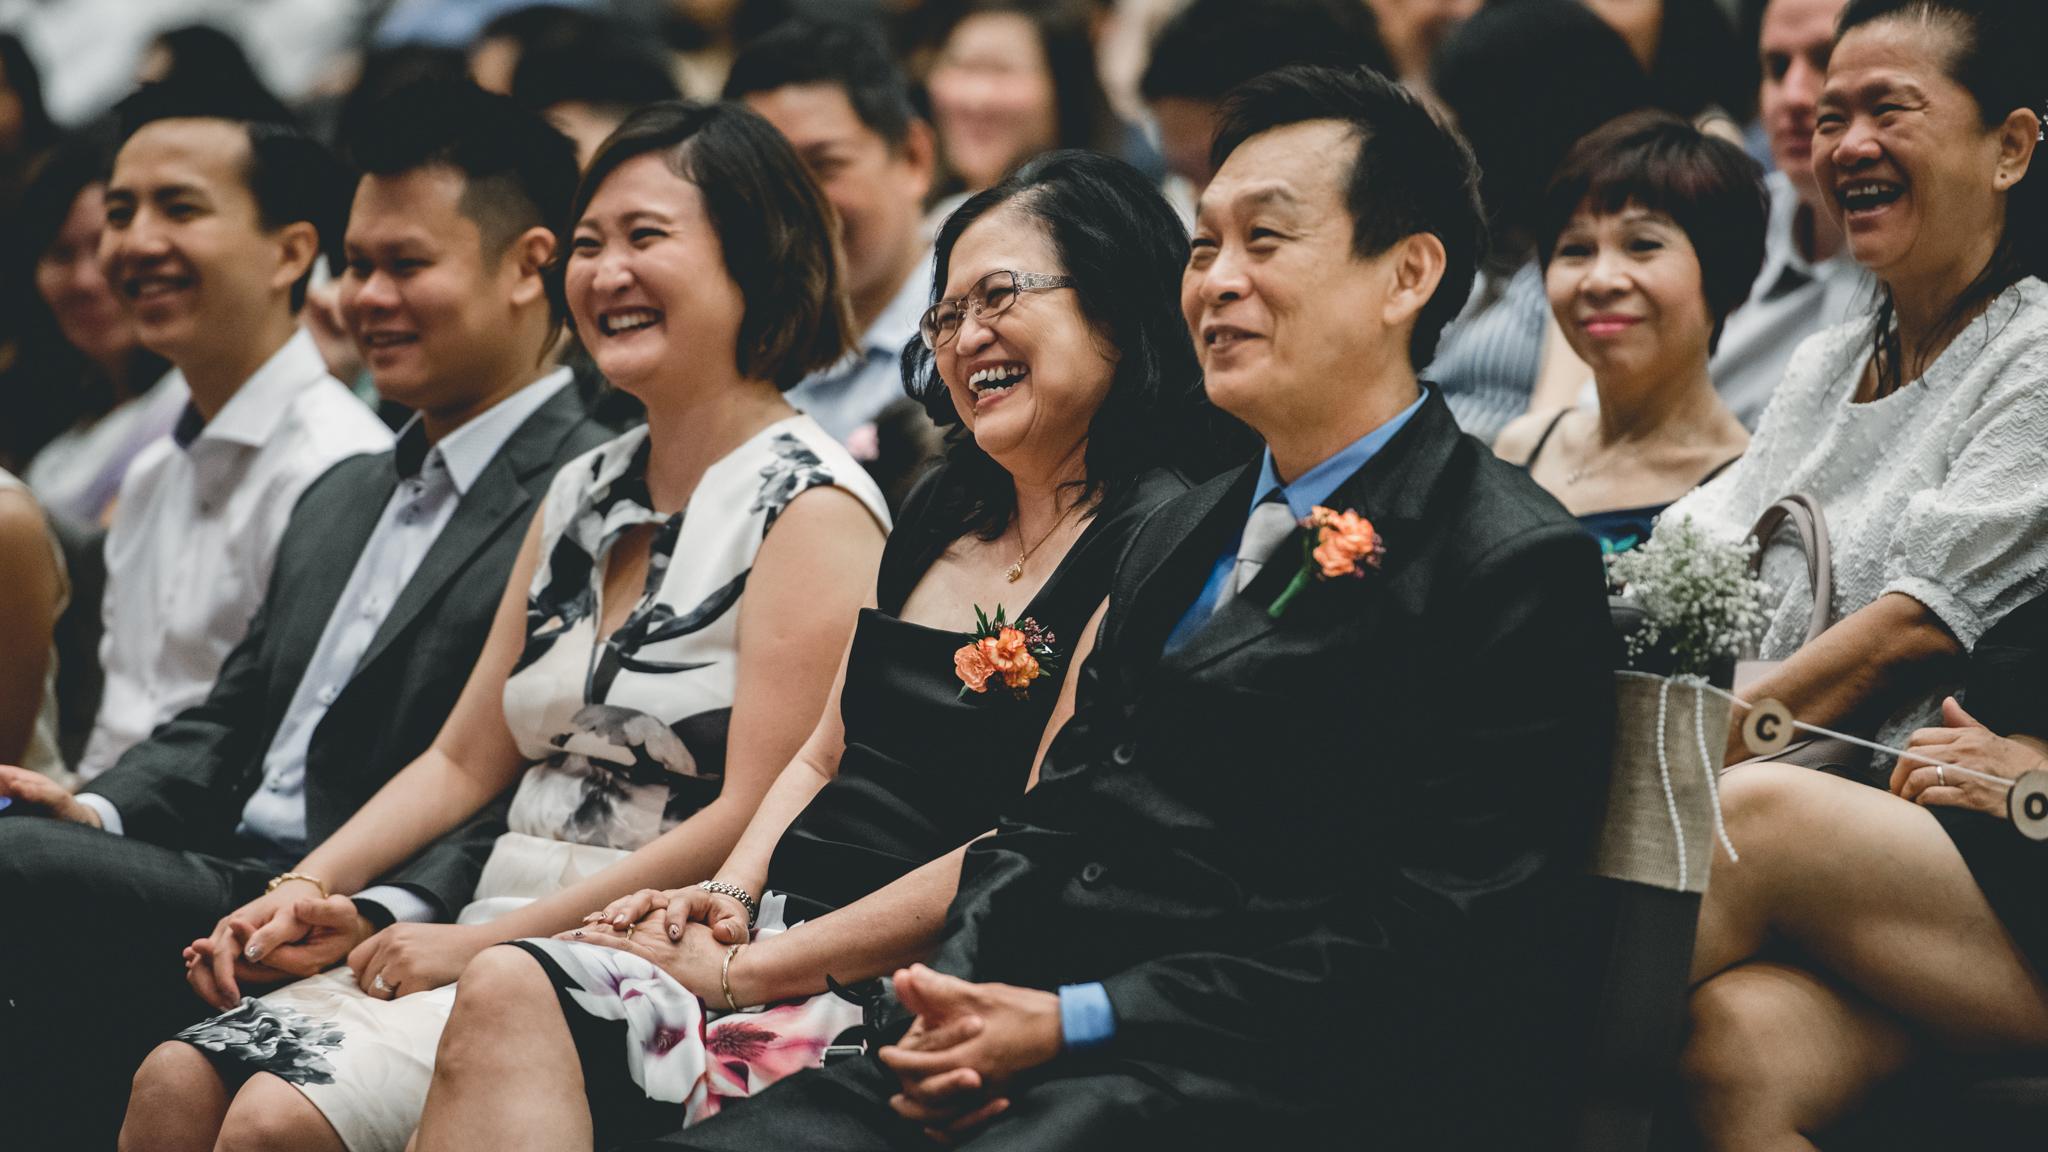 Church Wedding Bethel 00097.JPG